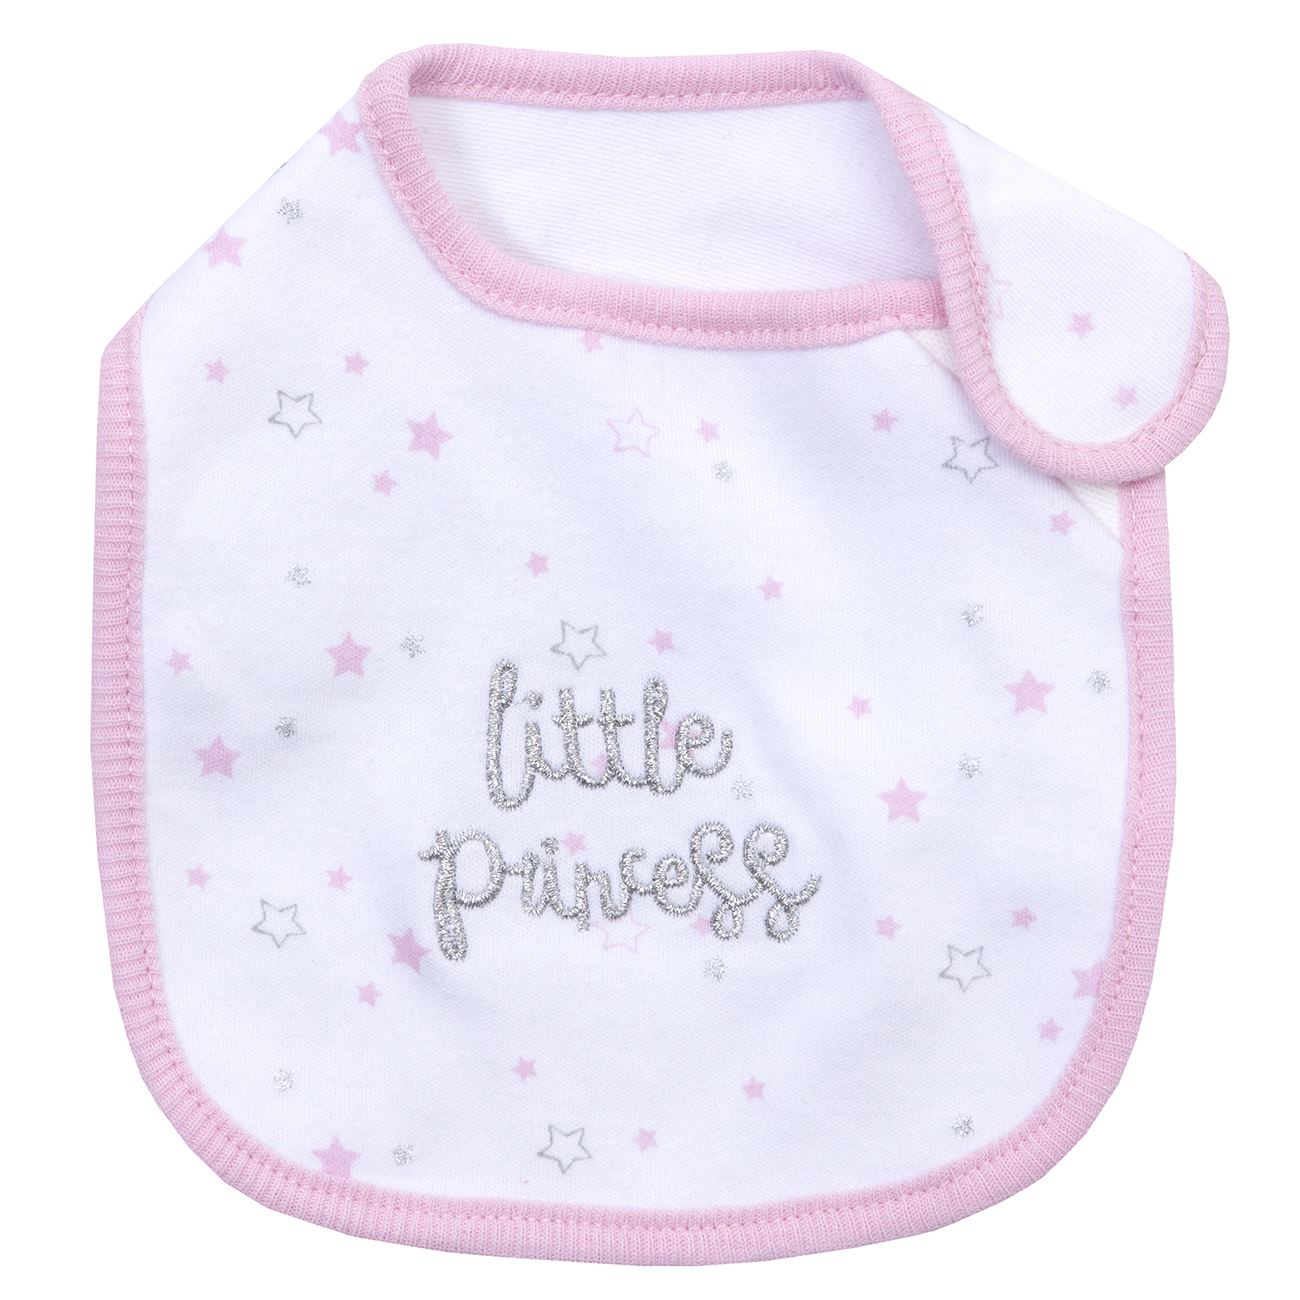 Babies Baby Girls Boys Sleepsuit Bib Hat Babygrow All in One Newborn Gift Set